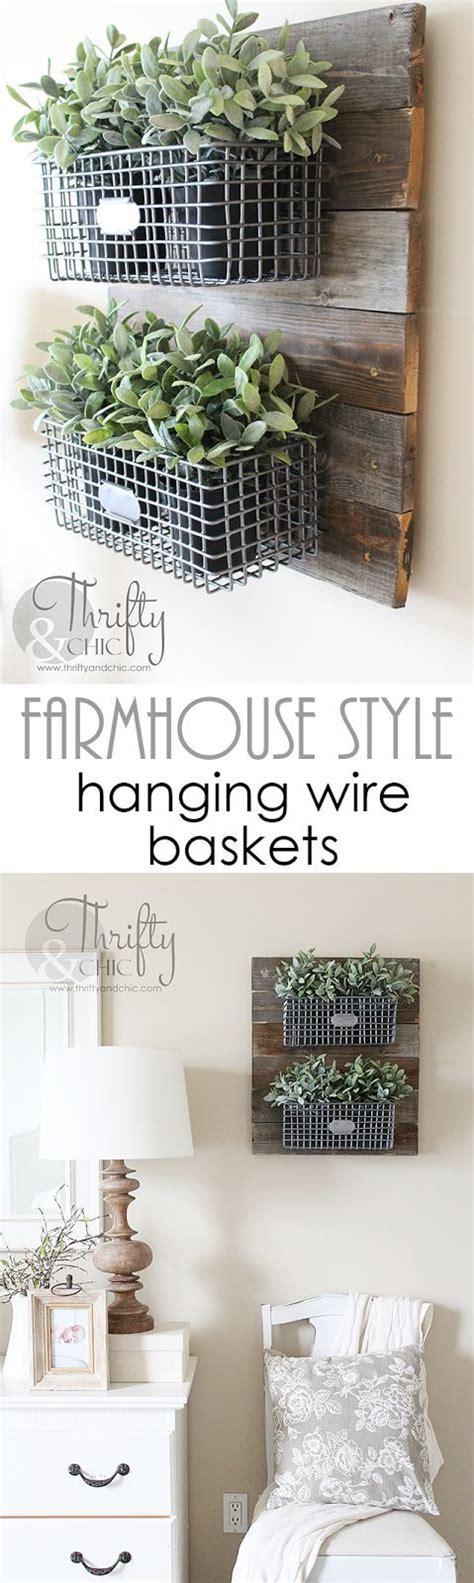 farmhouse decor gift basket 25 best ideas about wire basket decor on wire basket apartment plants and bathroom